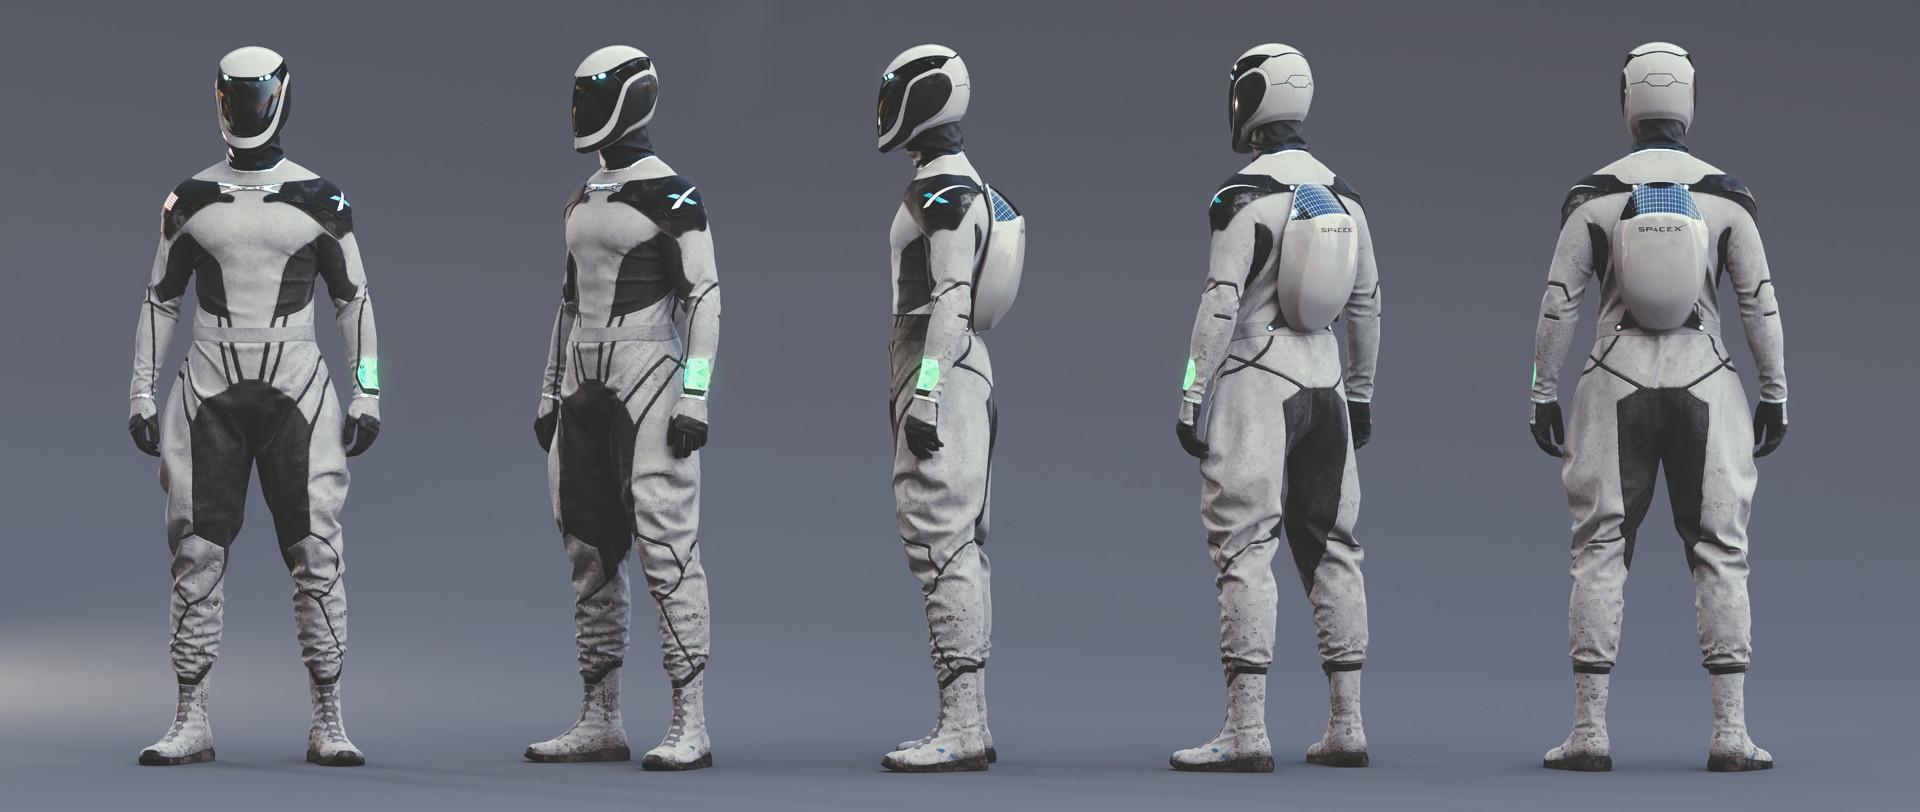 ArtStation - SpaceX Space Suit Concept, Lucas Valle